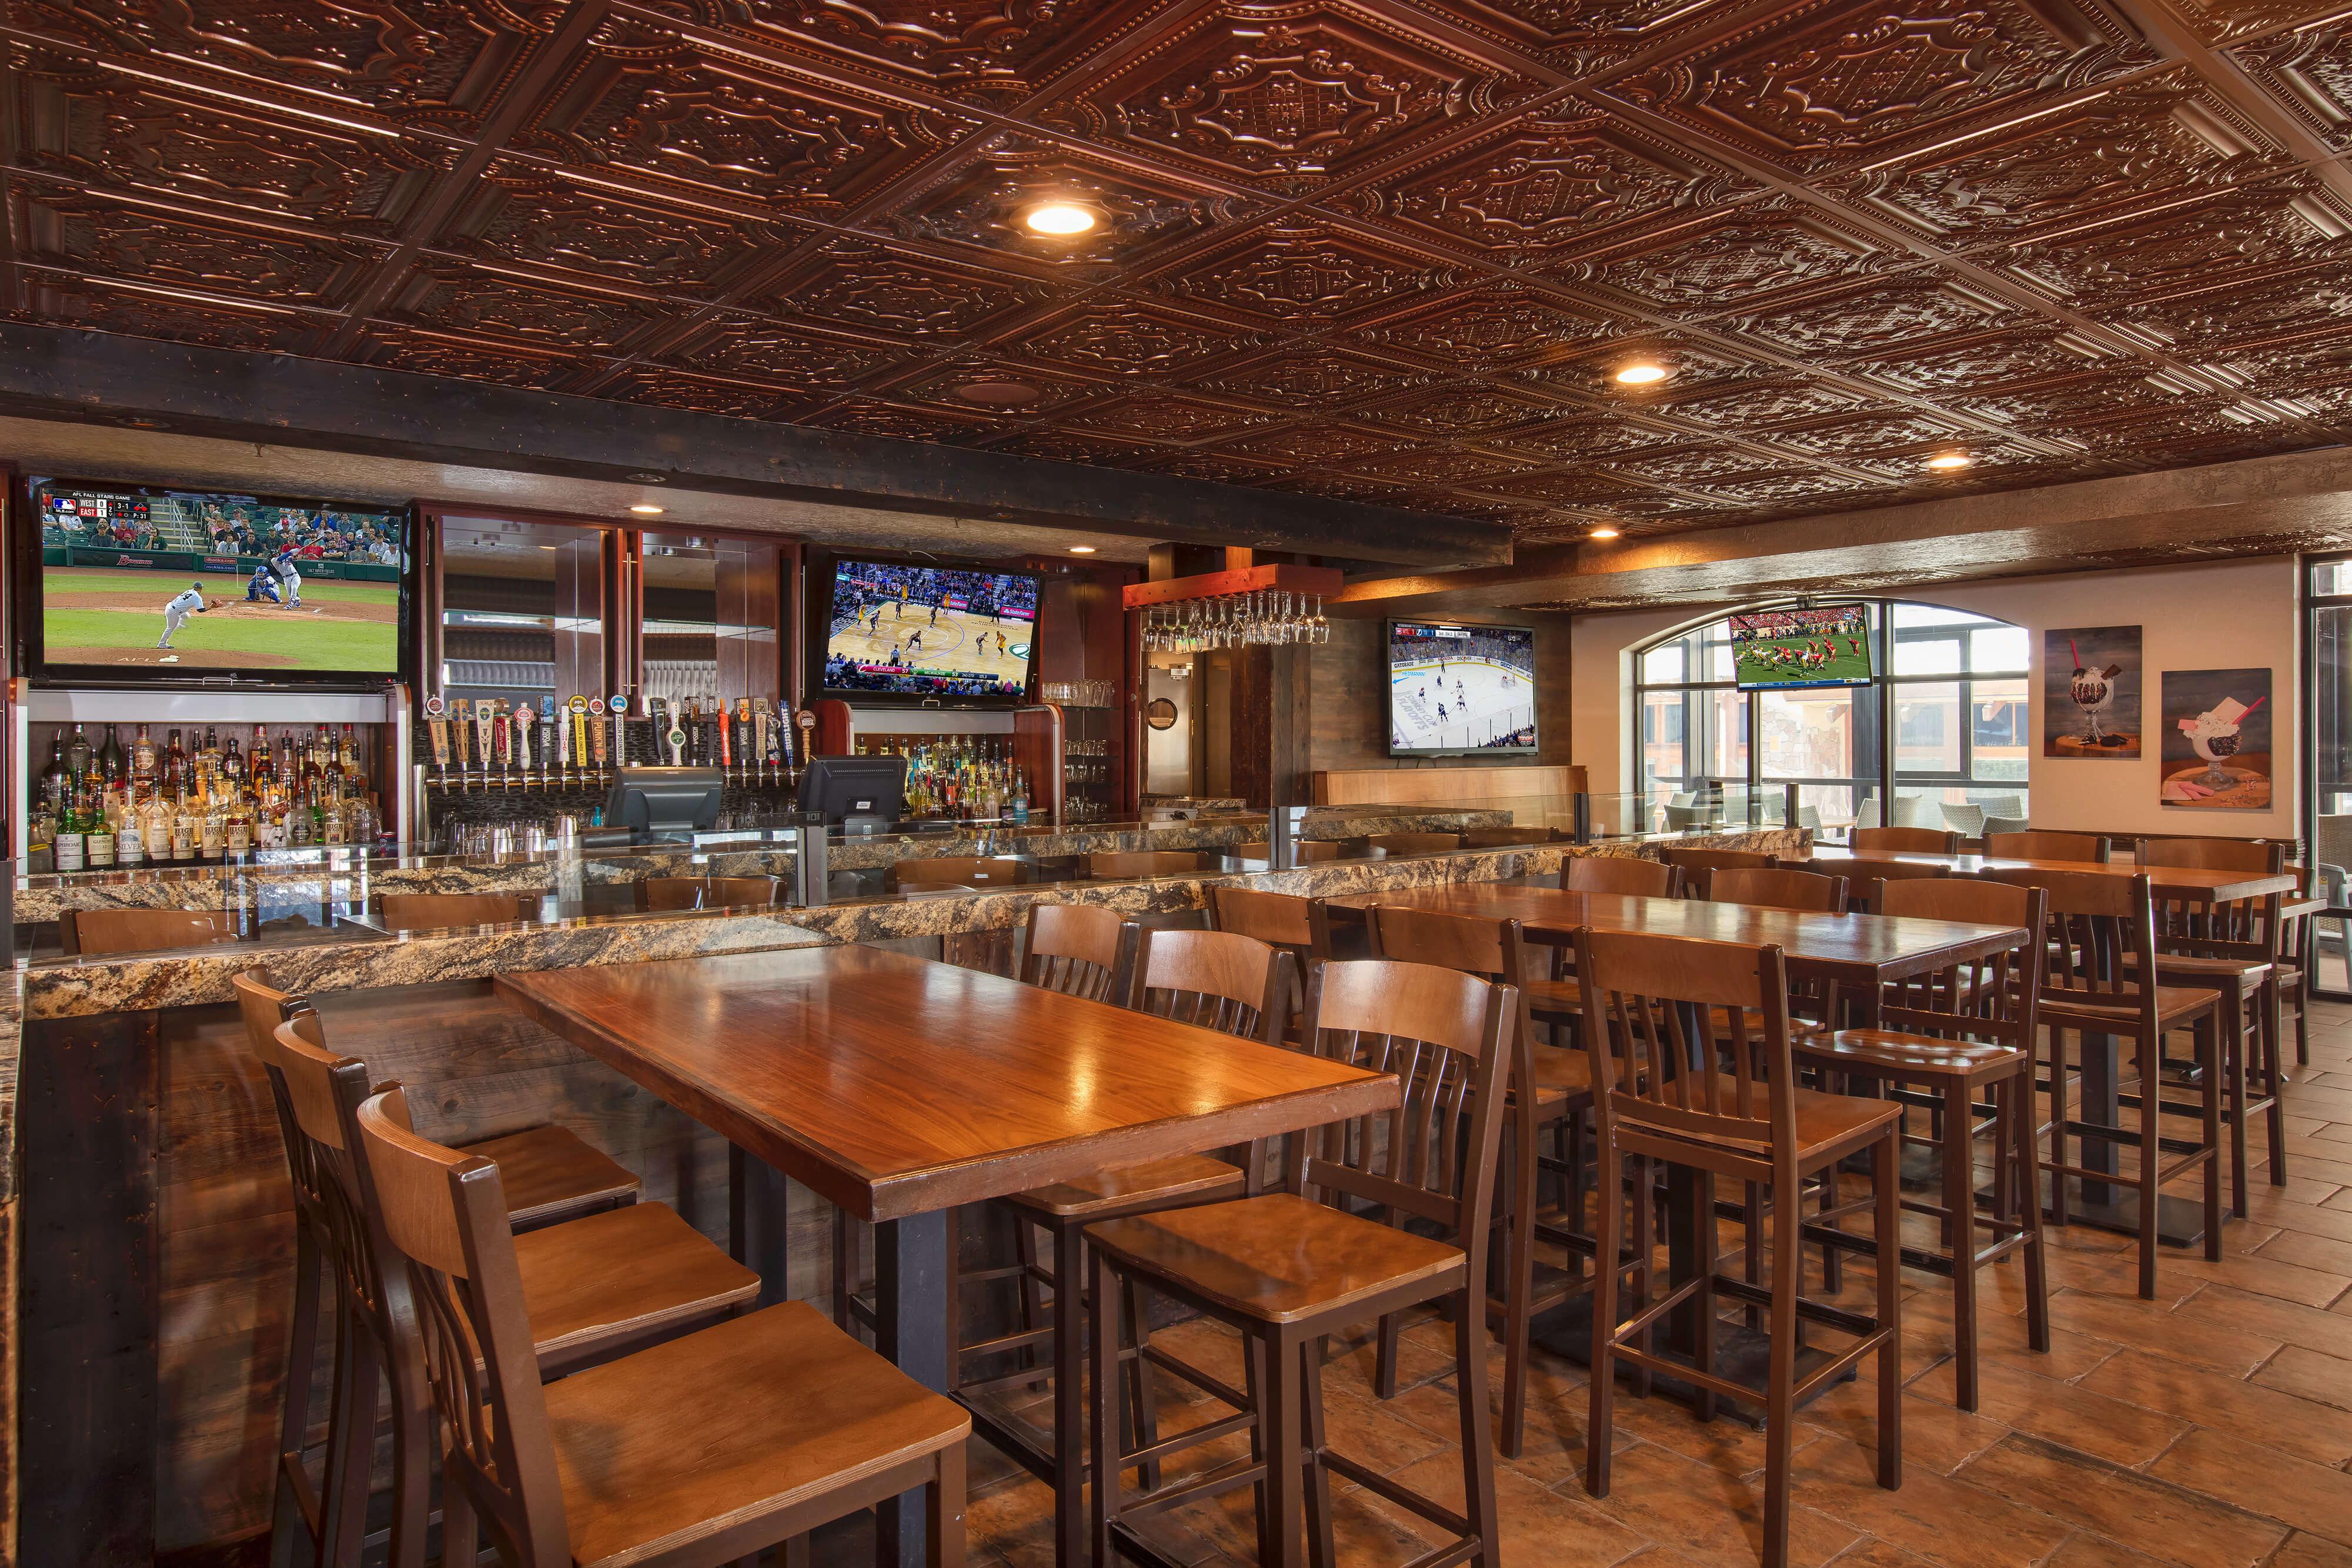 Drafts Burger Bar Has The Best Restaurant In Park City Utah Westgate Resort